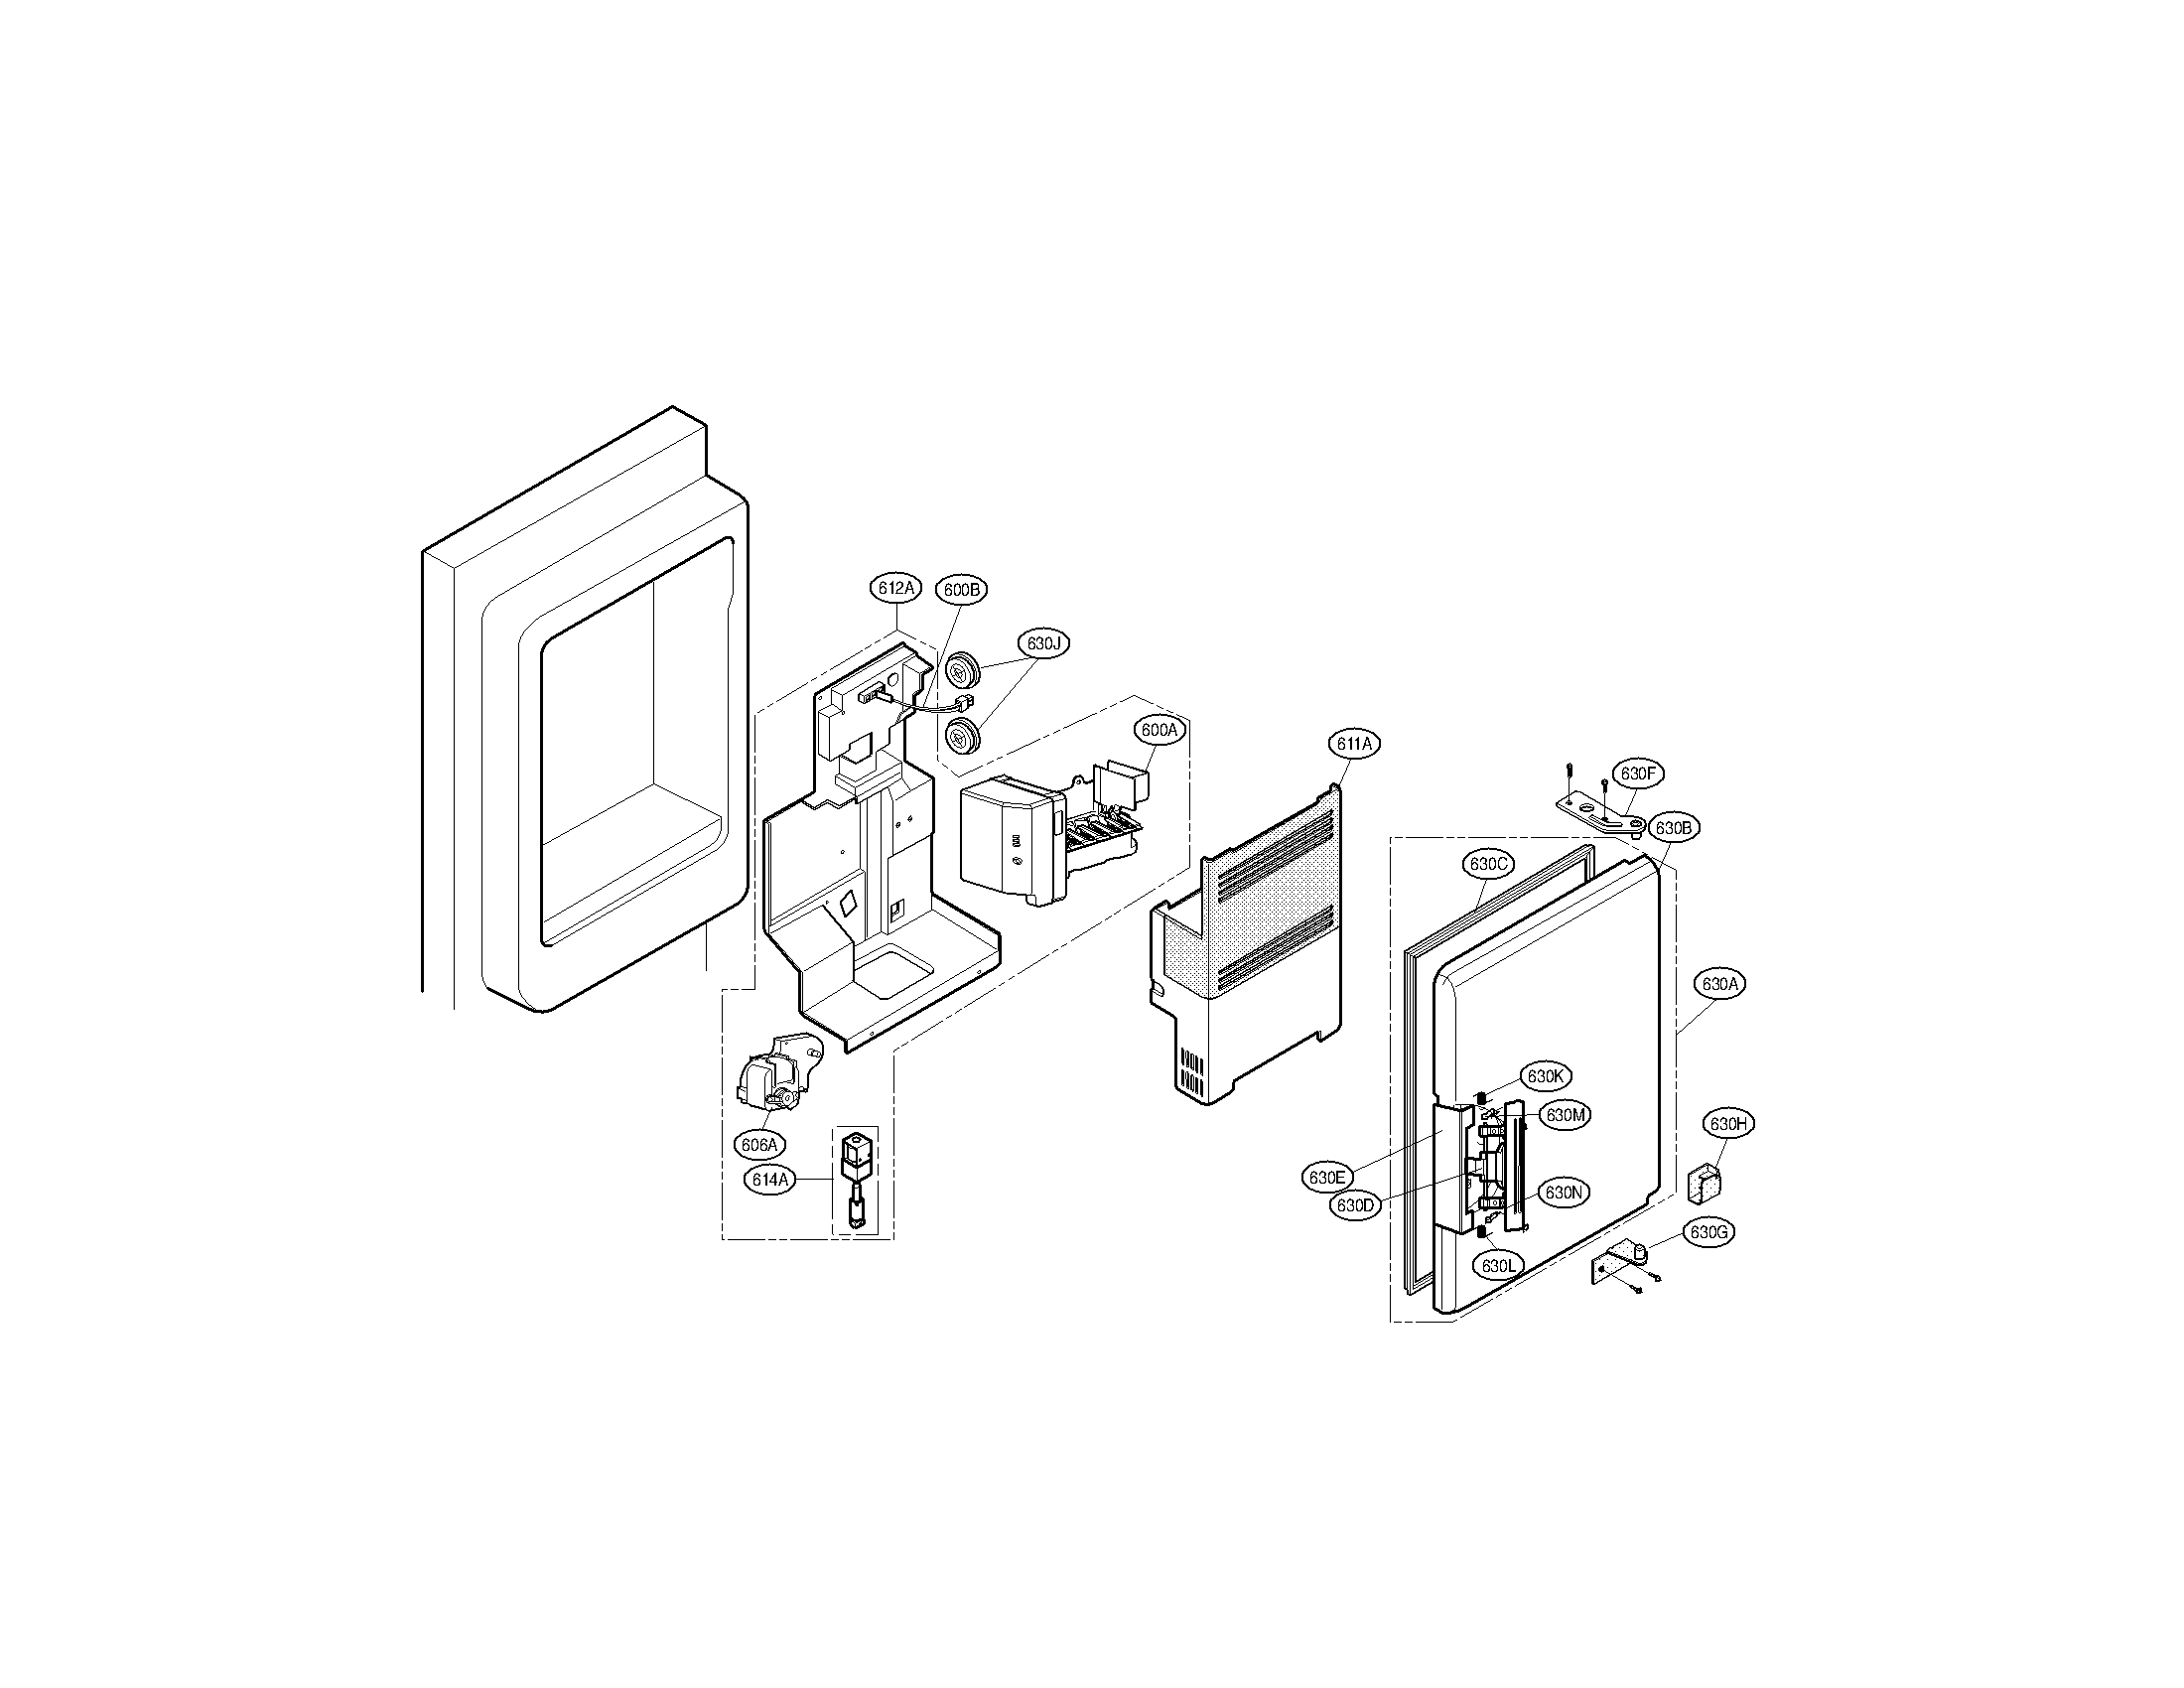 Kenmore model 79571023011 bottom-mount refrigerator